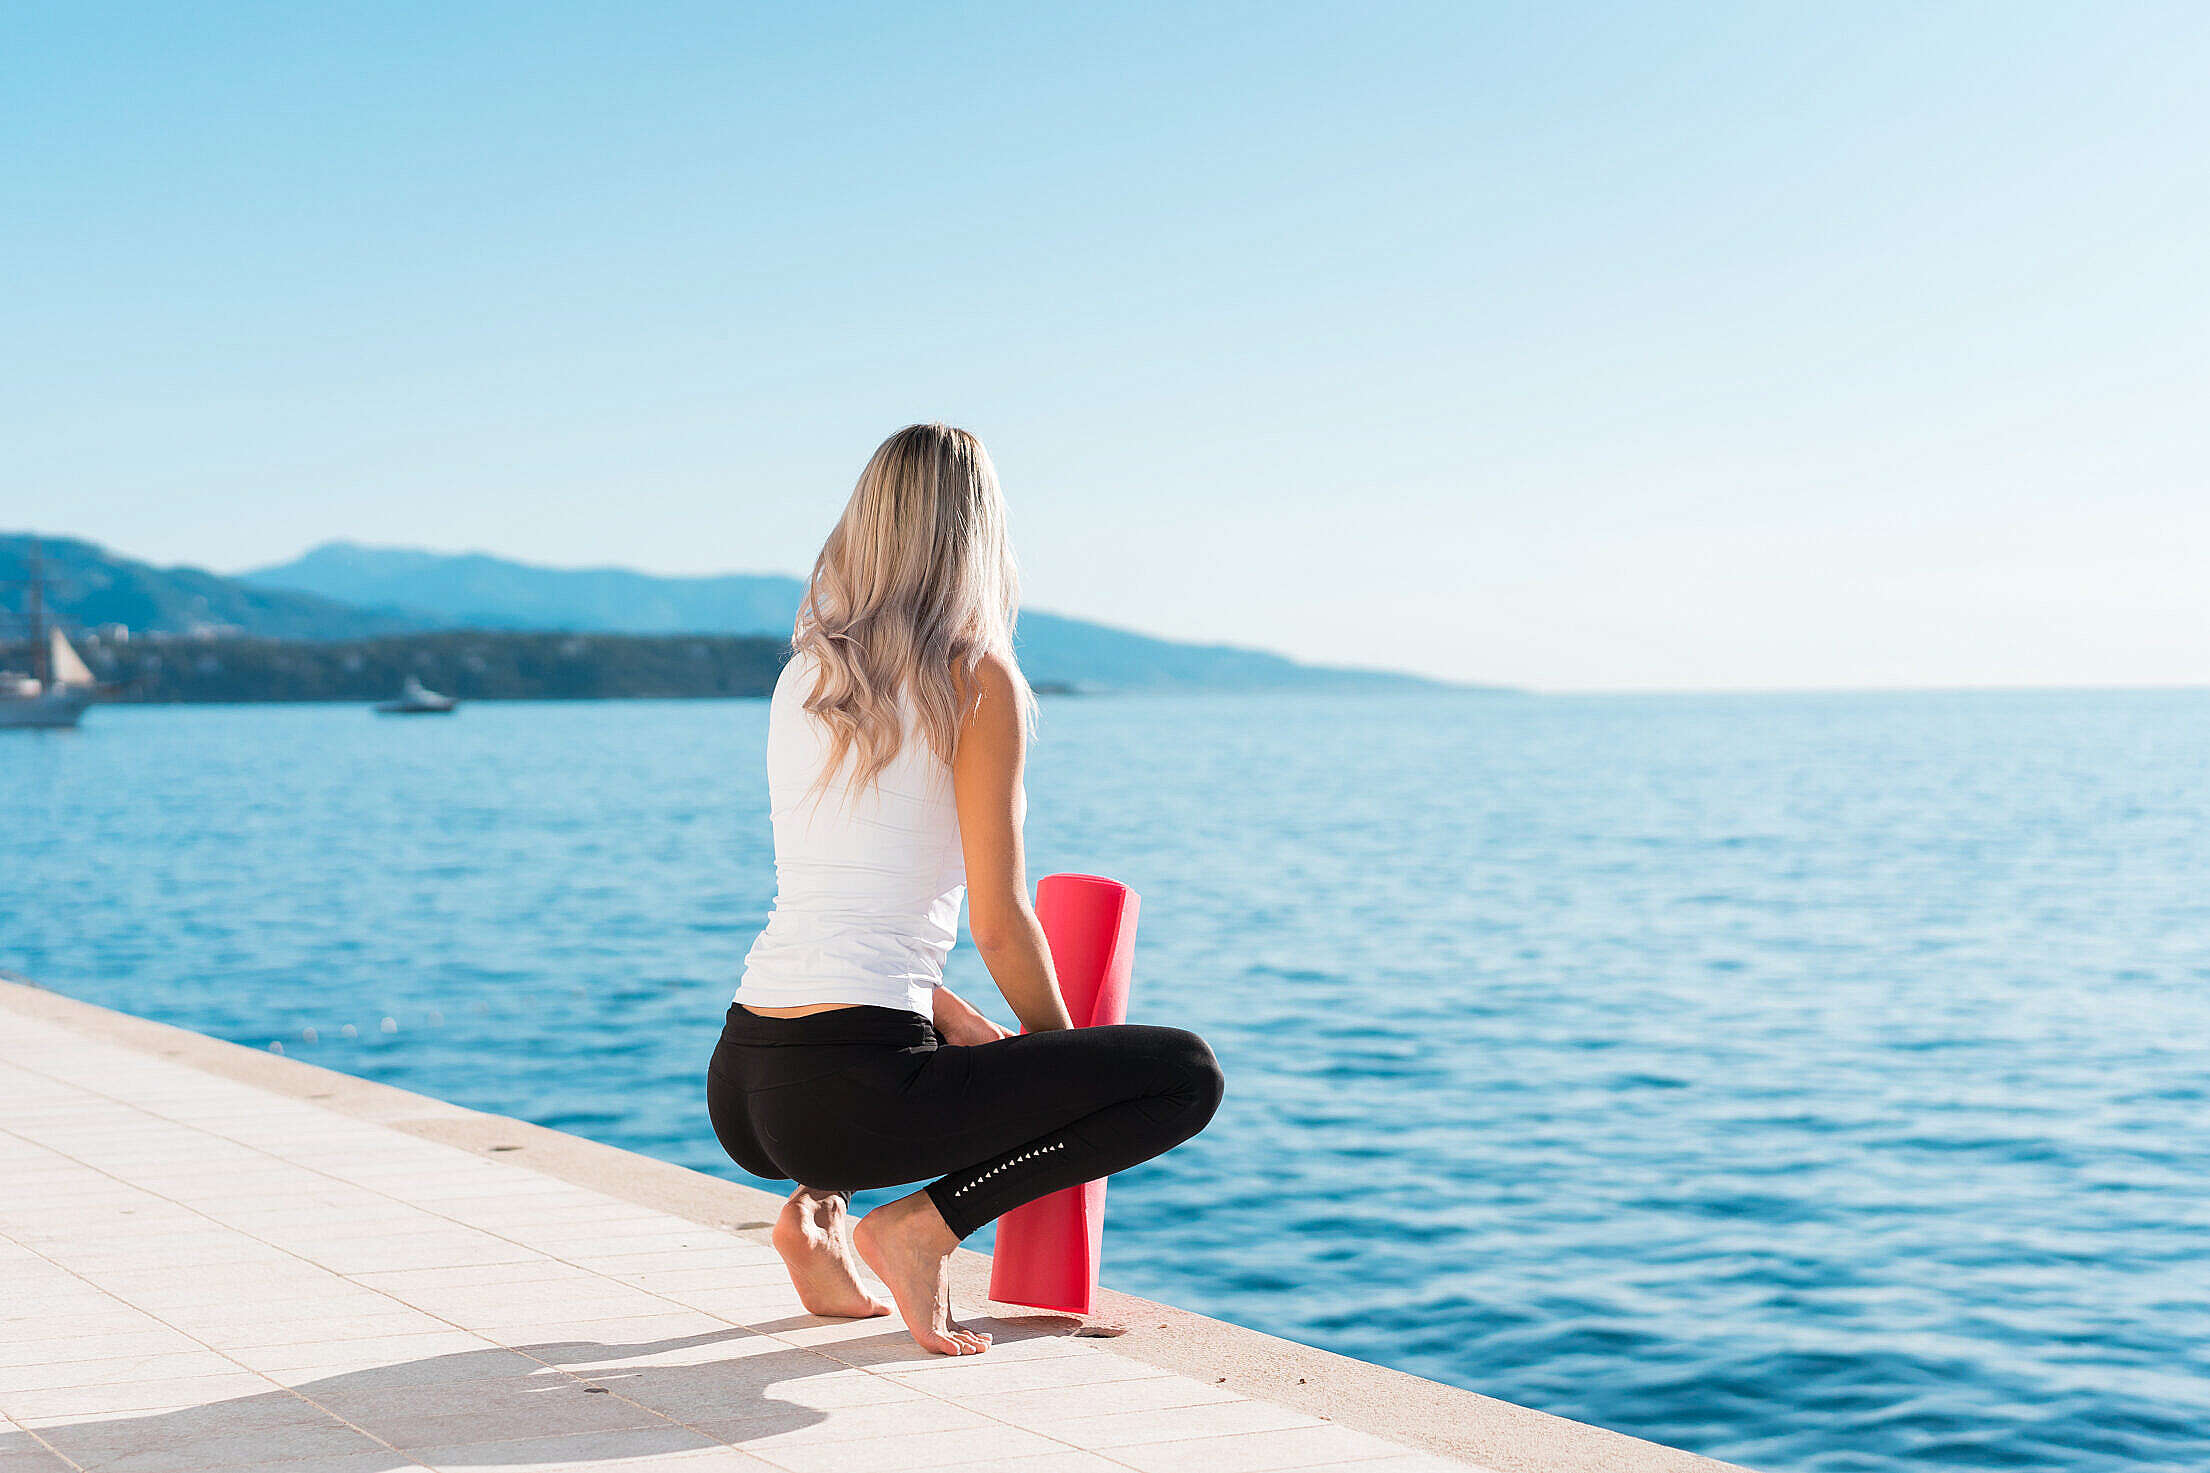 Woman Ready to Start Morning Yoga Free Stock Photo